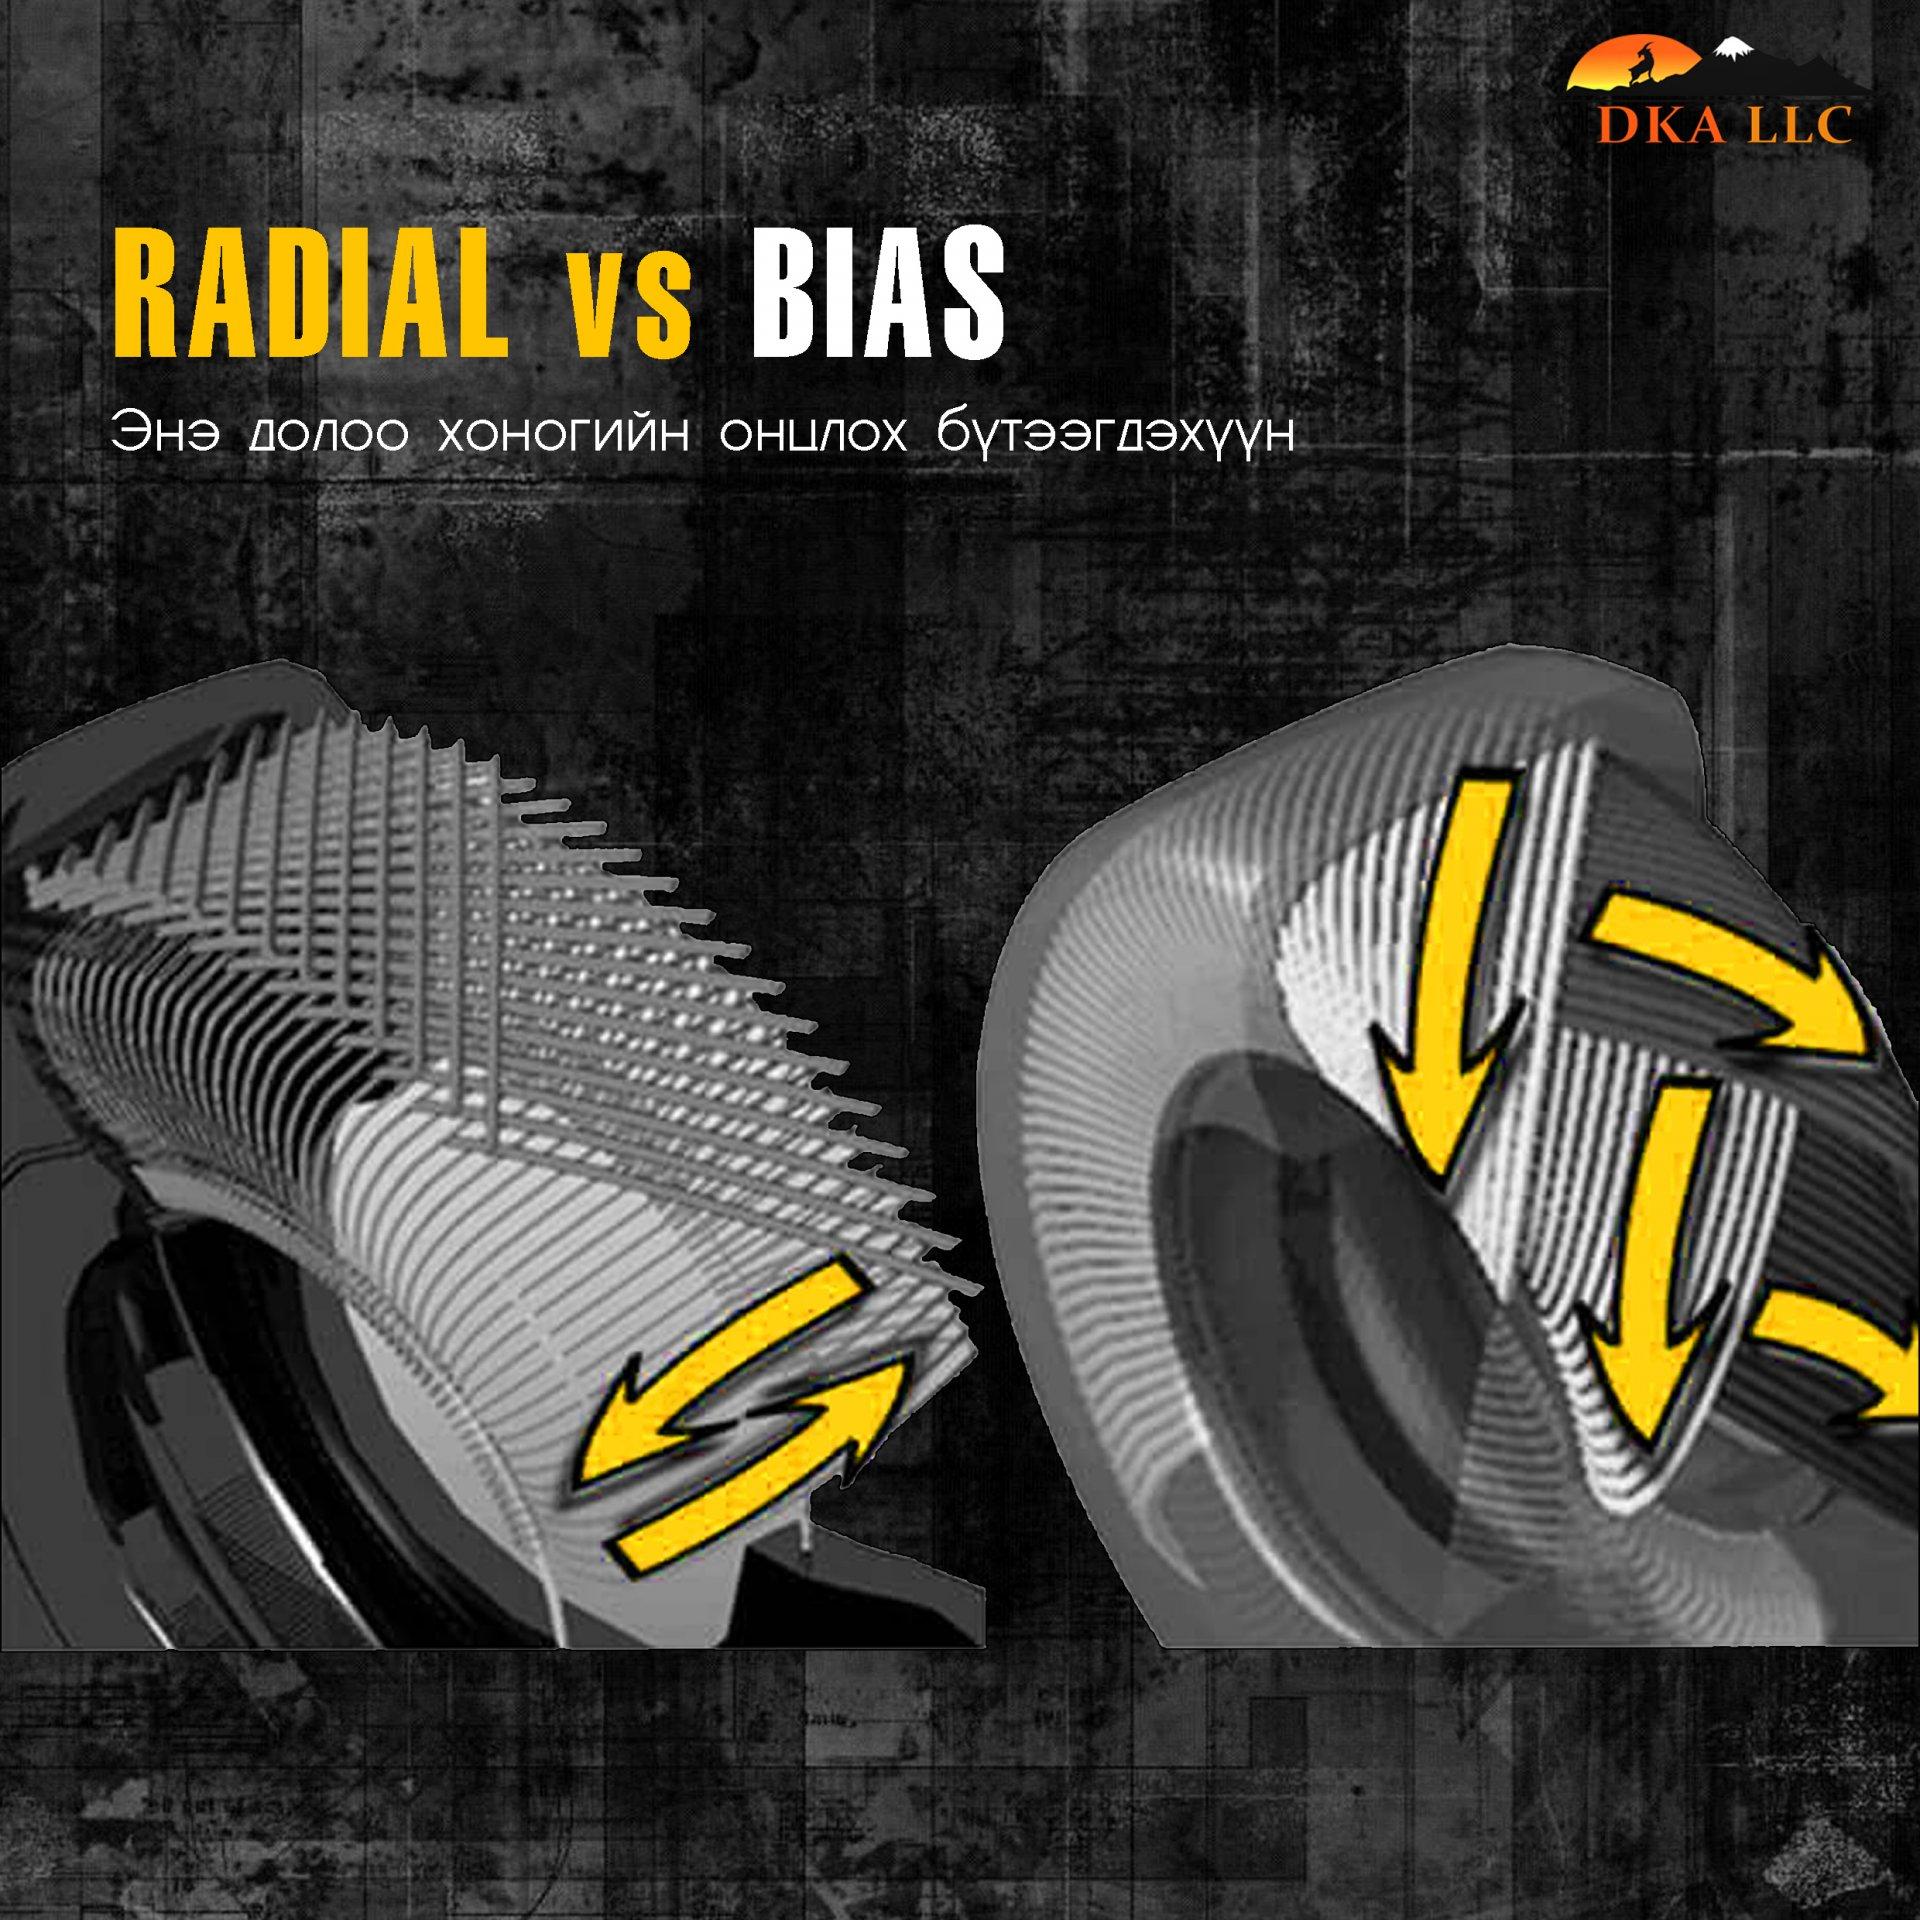 RADIAL vs BIAS